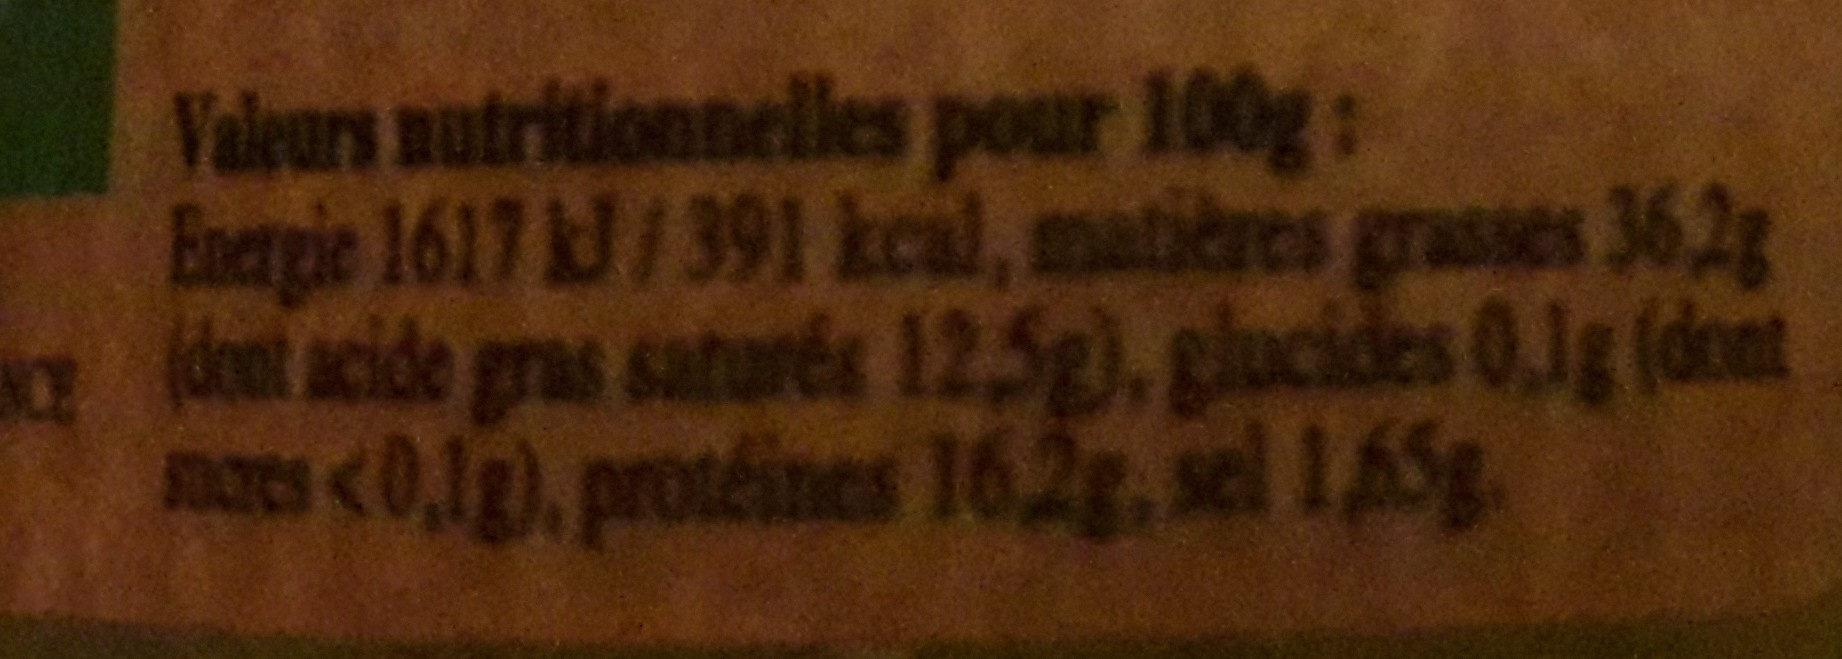 Terrines artisanales biologiques corses - Valori nutrizionali - fr